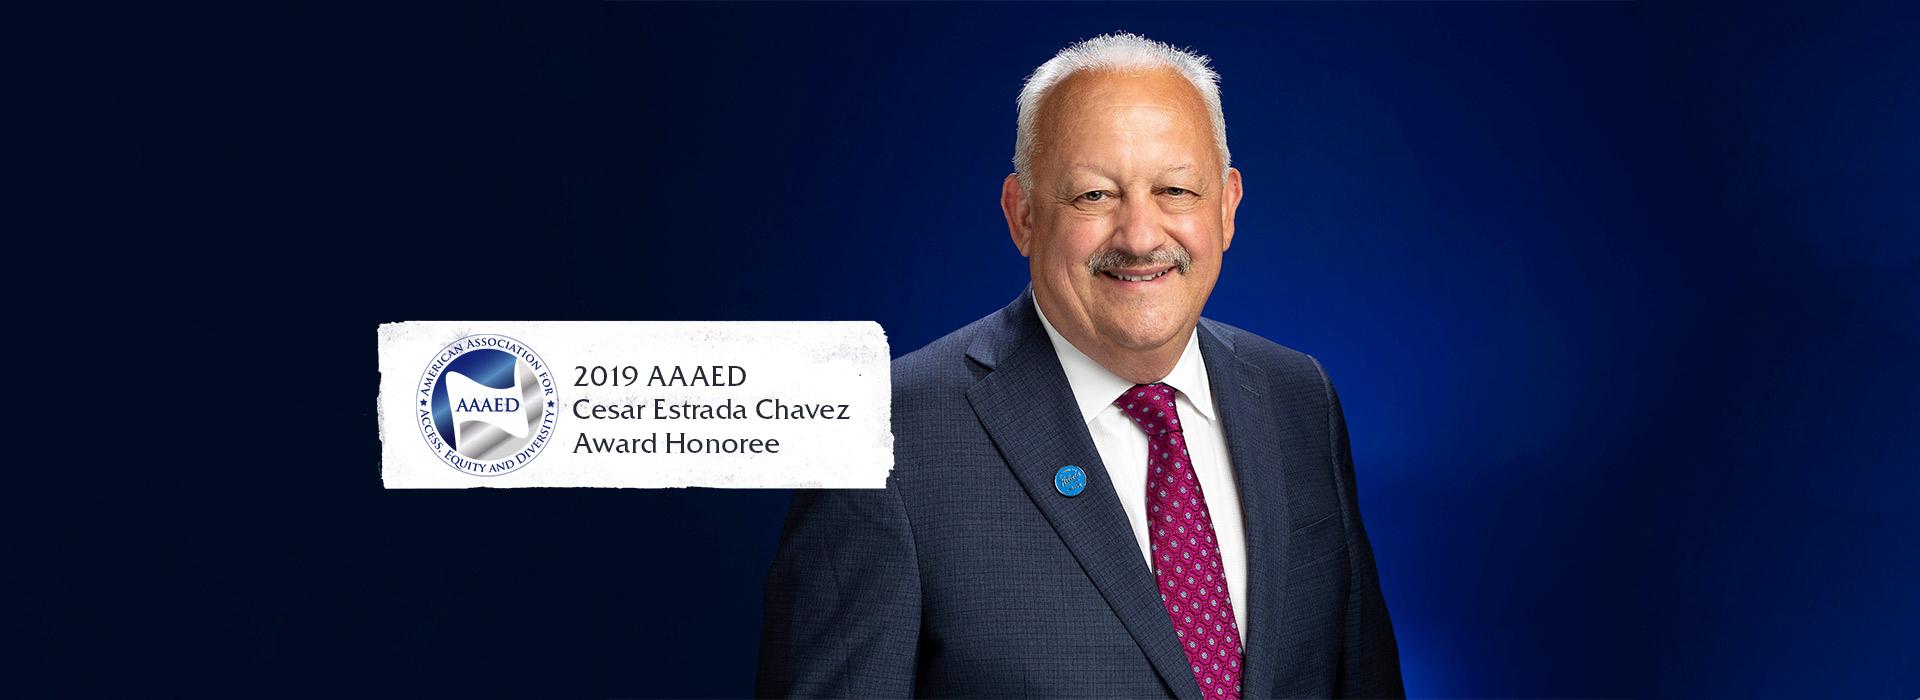 CSUSB president to receive the AAAED Cesar Estrada Chavez Award